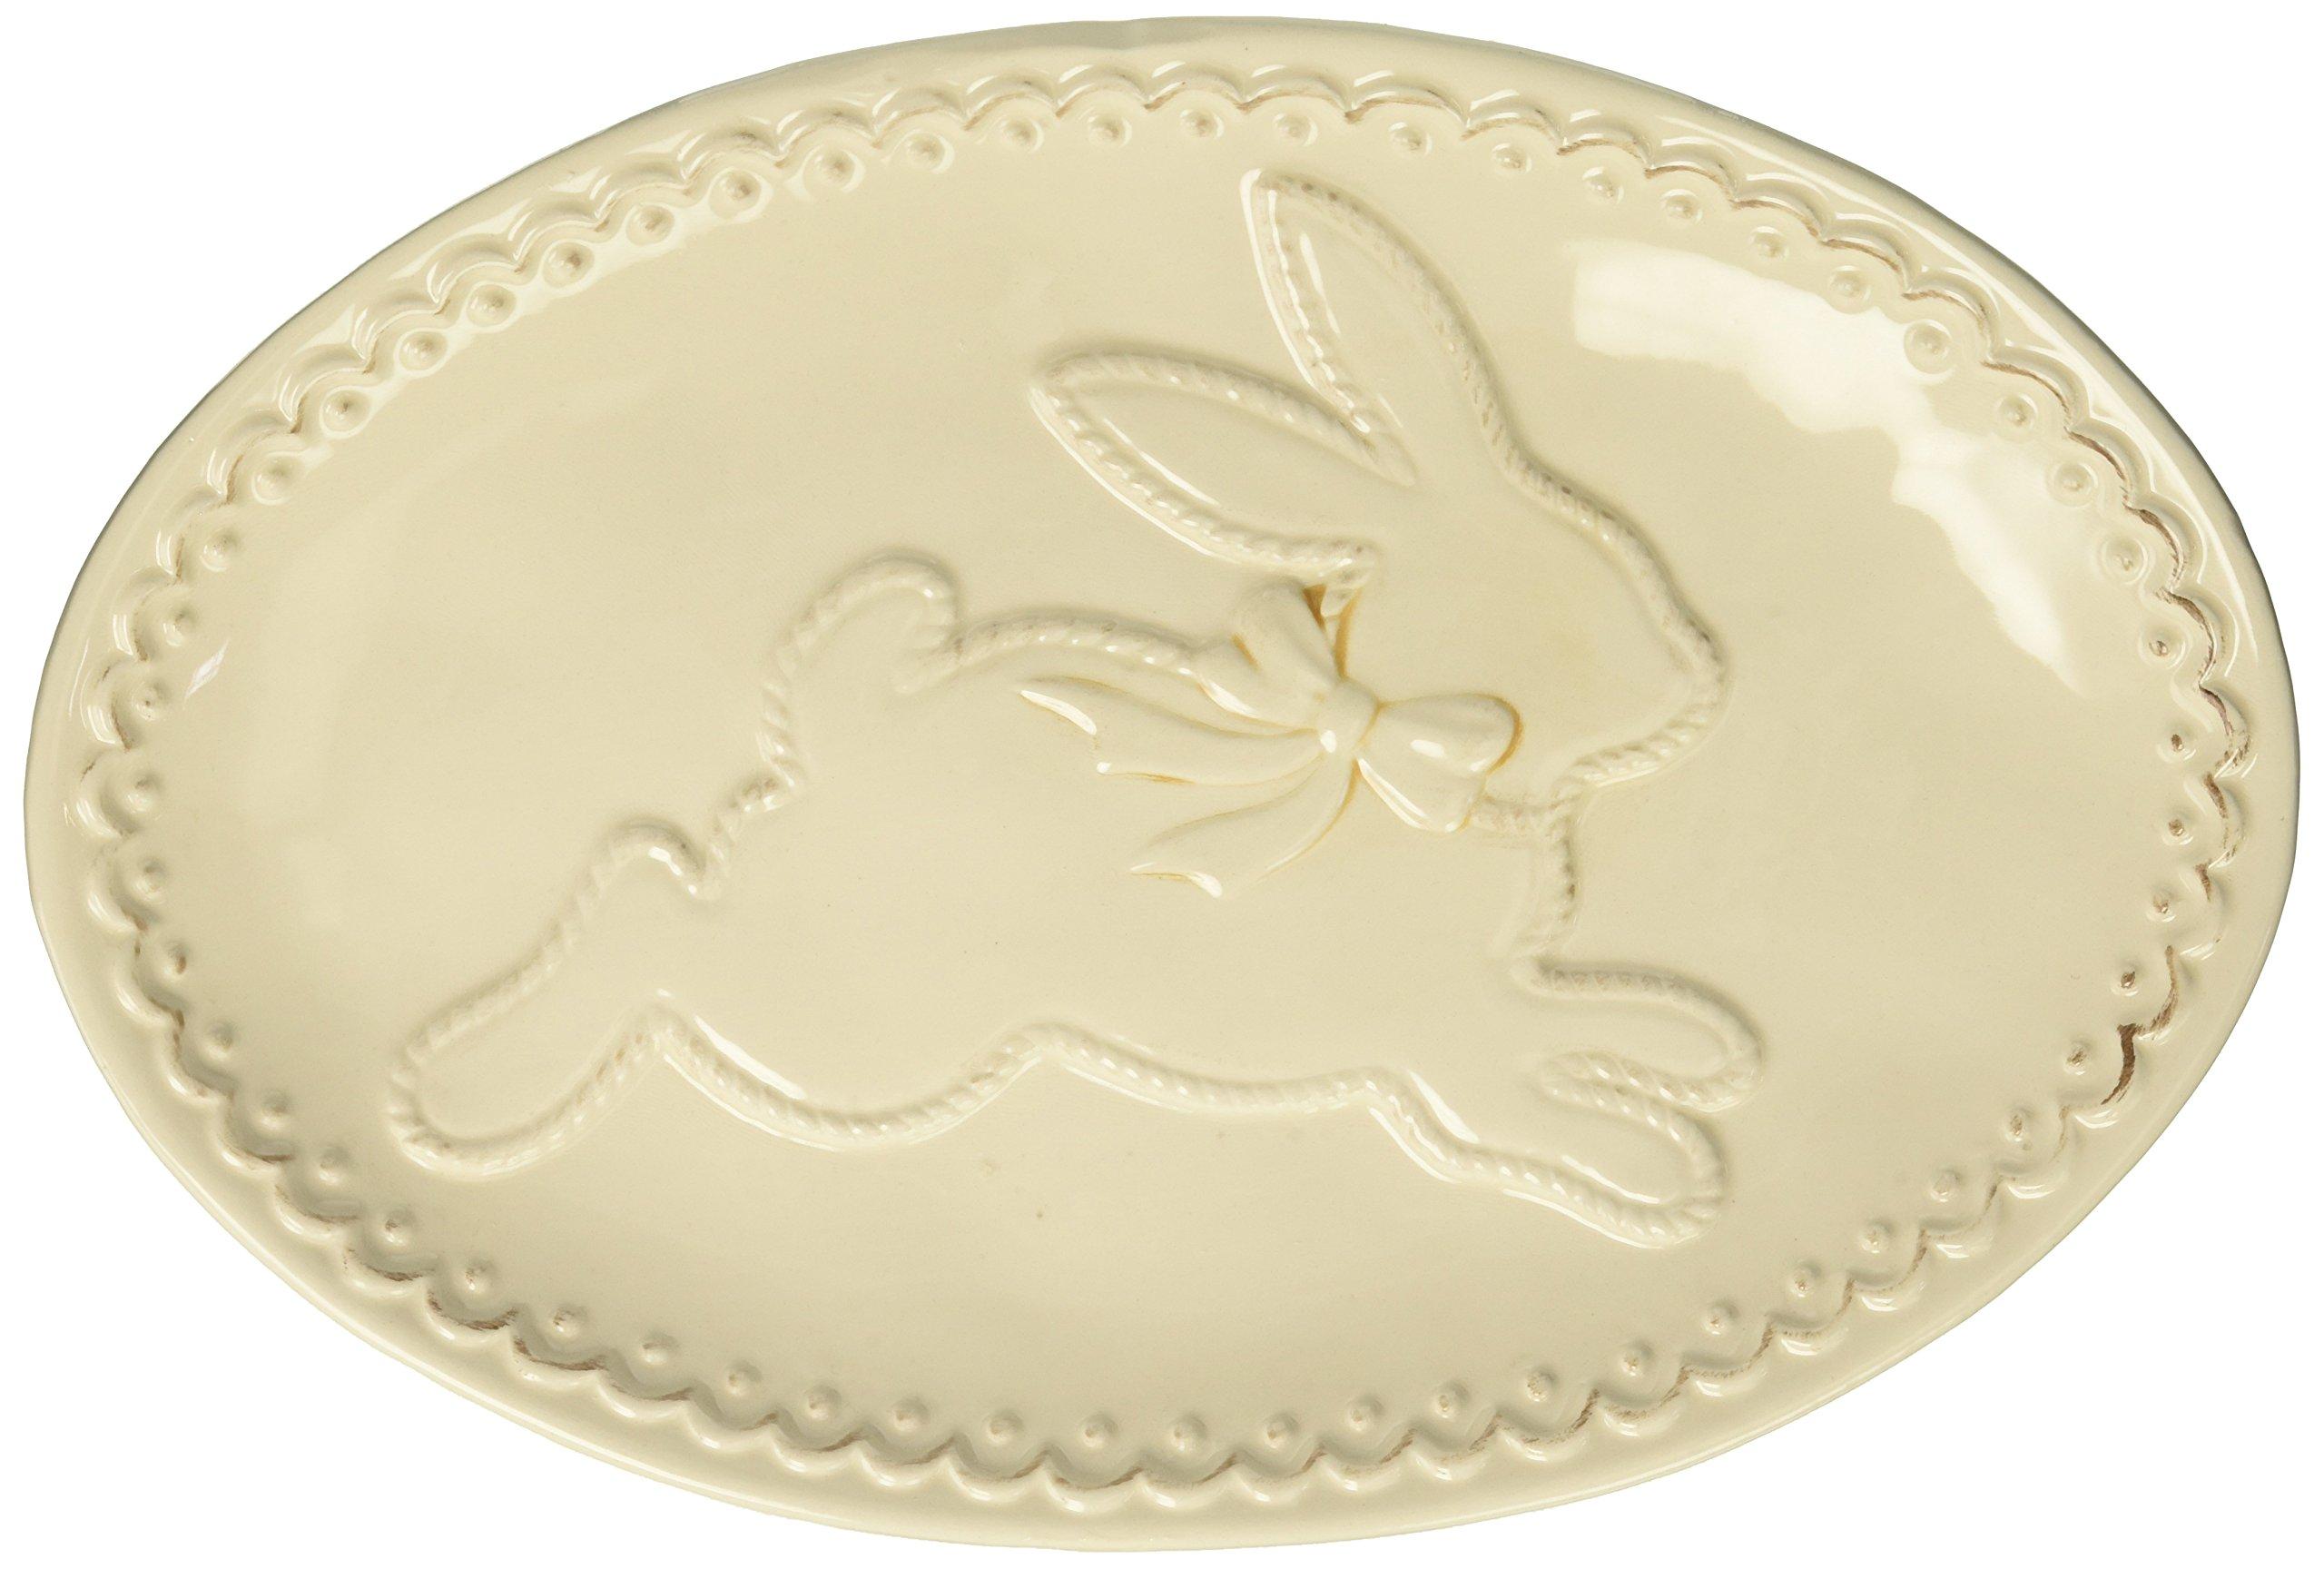 Burton and Burton Raised Easter Bunny Serving Platter, Cream, 11''